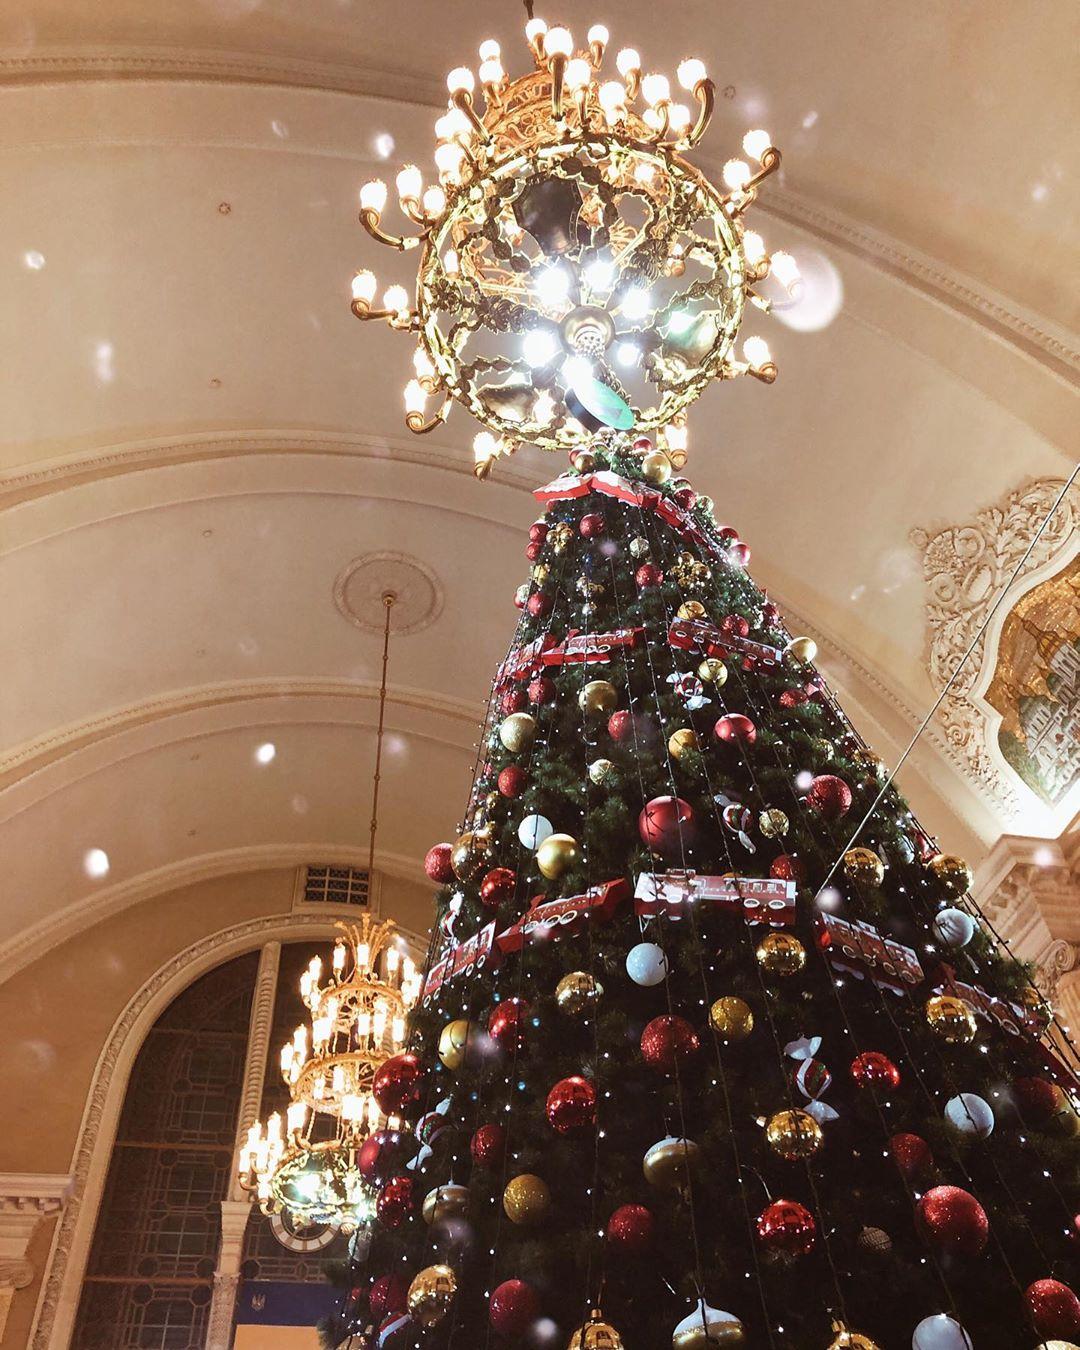 Больше елок - красивых и разных. Фото - @yuliia_noskova